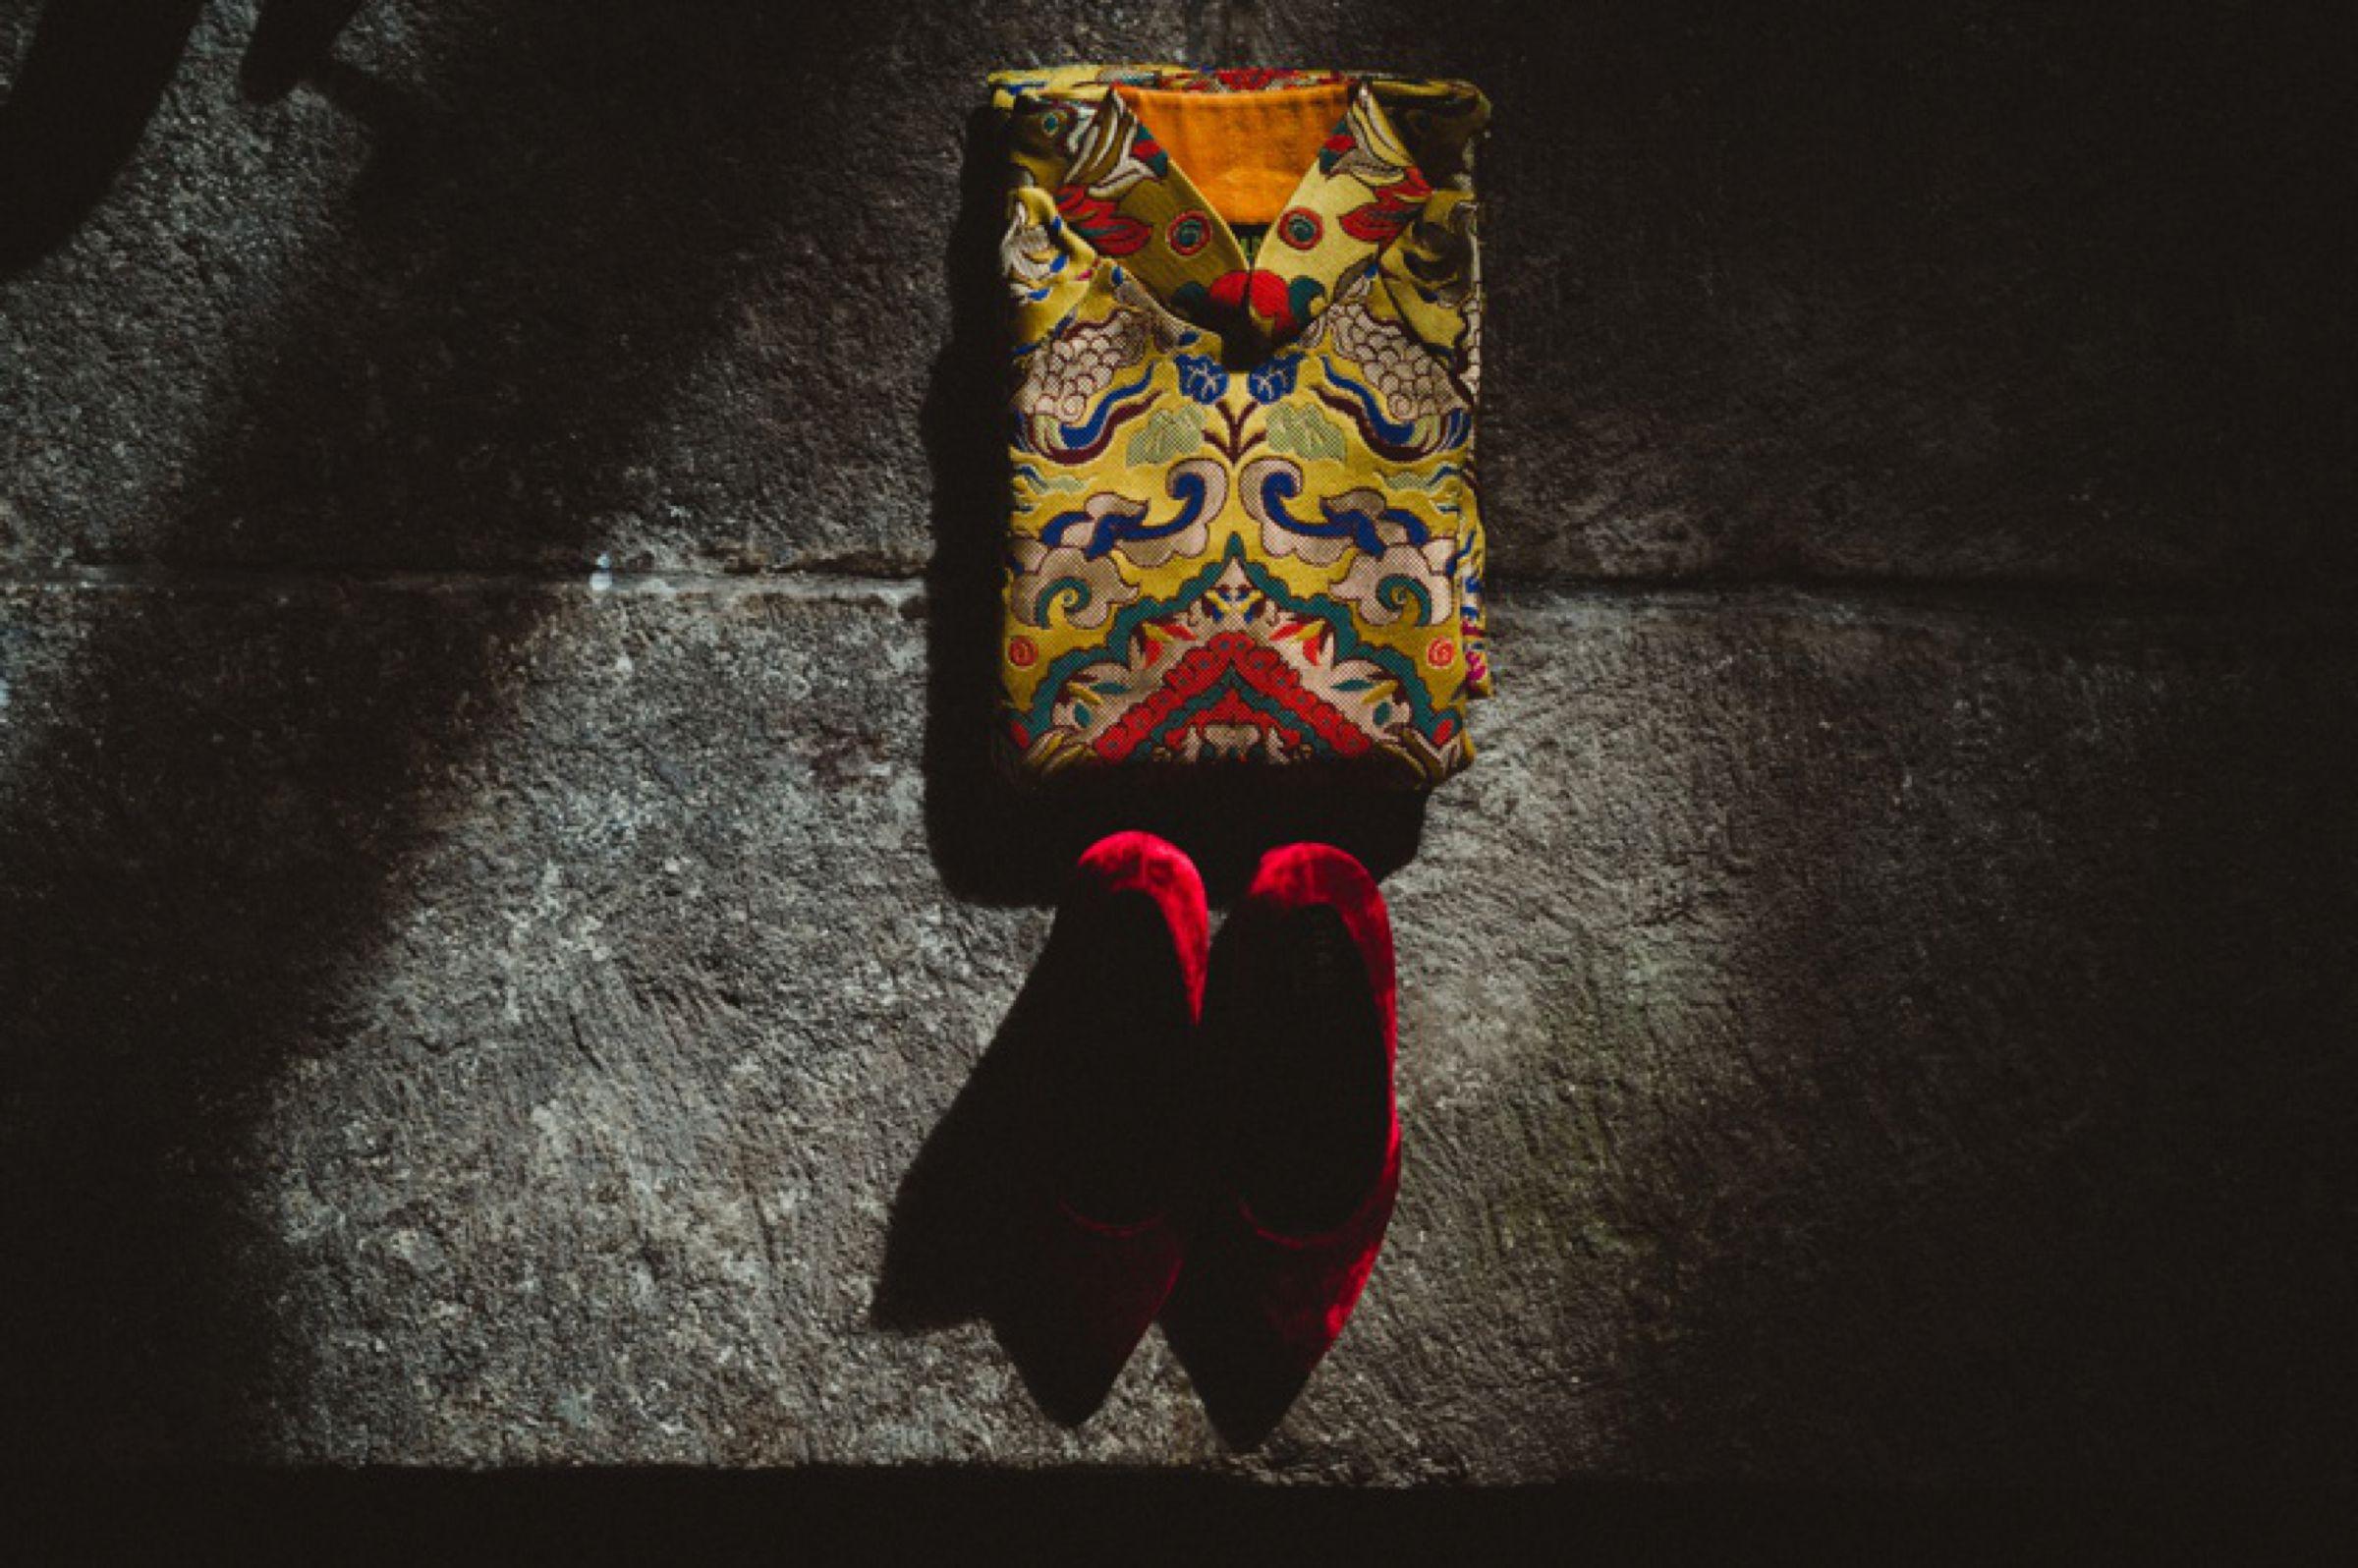 Tim-Danika-Bali-Wedding-Pyara-Photo-Evans 5.jpg